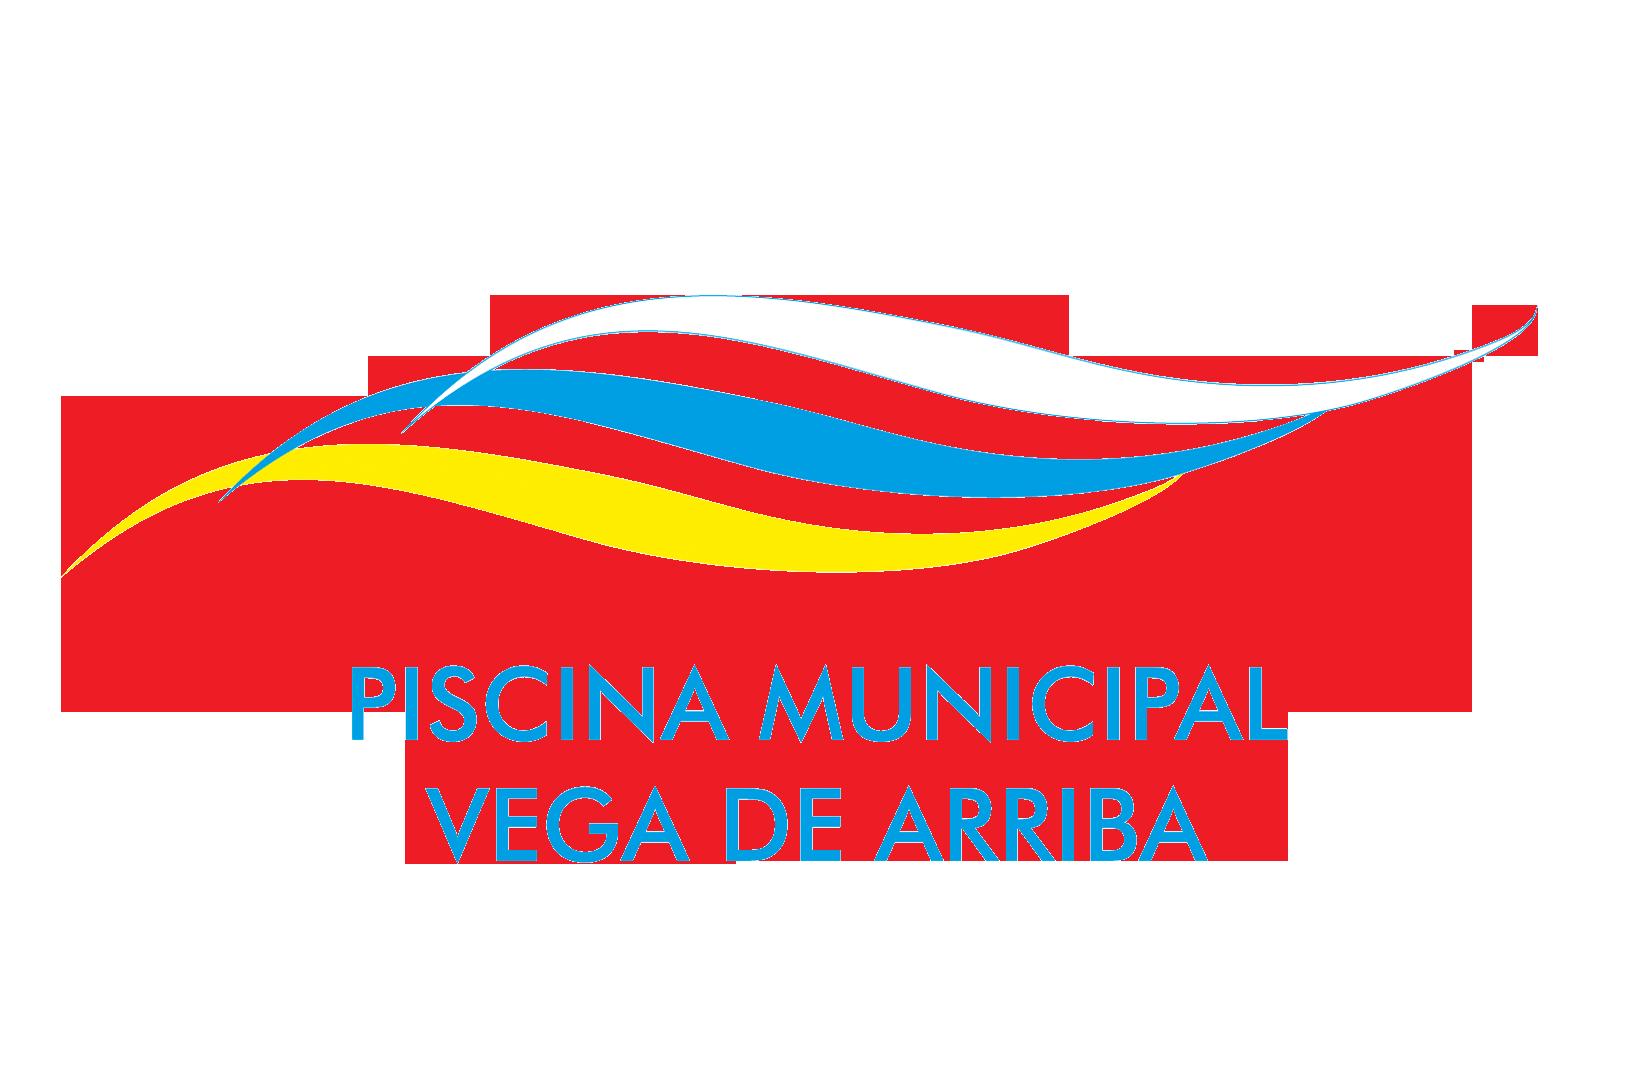 d8deef85 Piscina Municipal Vega d'Arriba - Ayuntamiento de Mieres